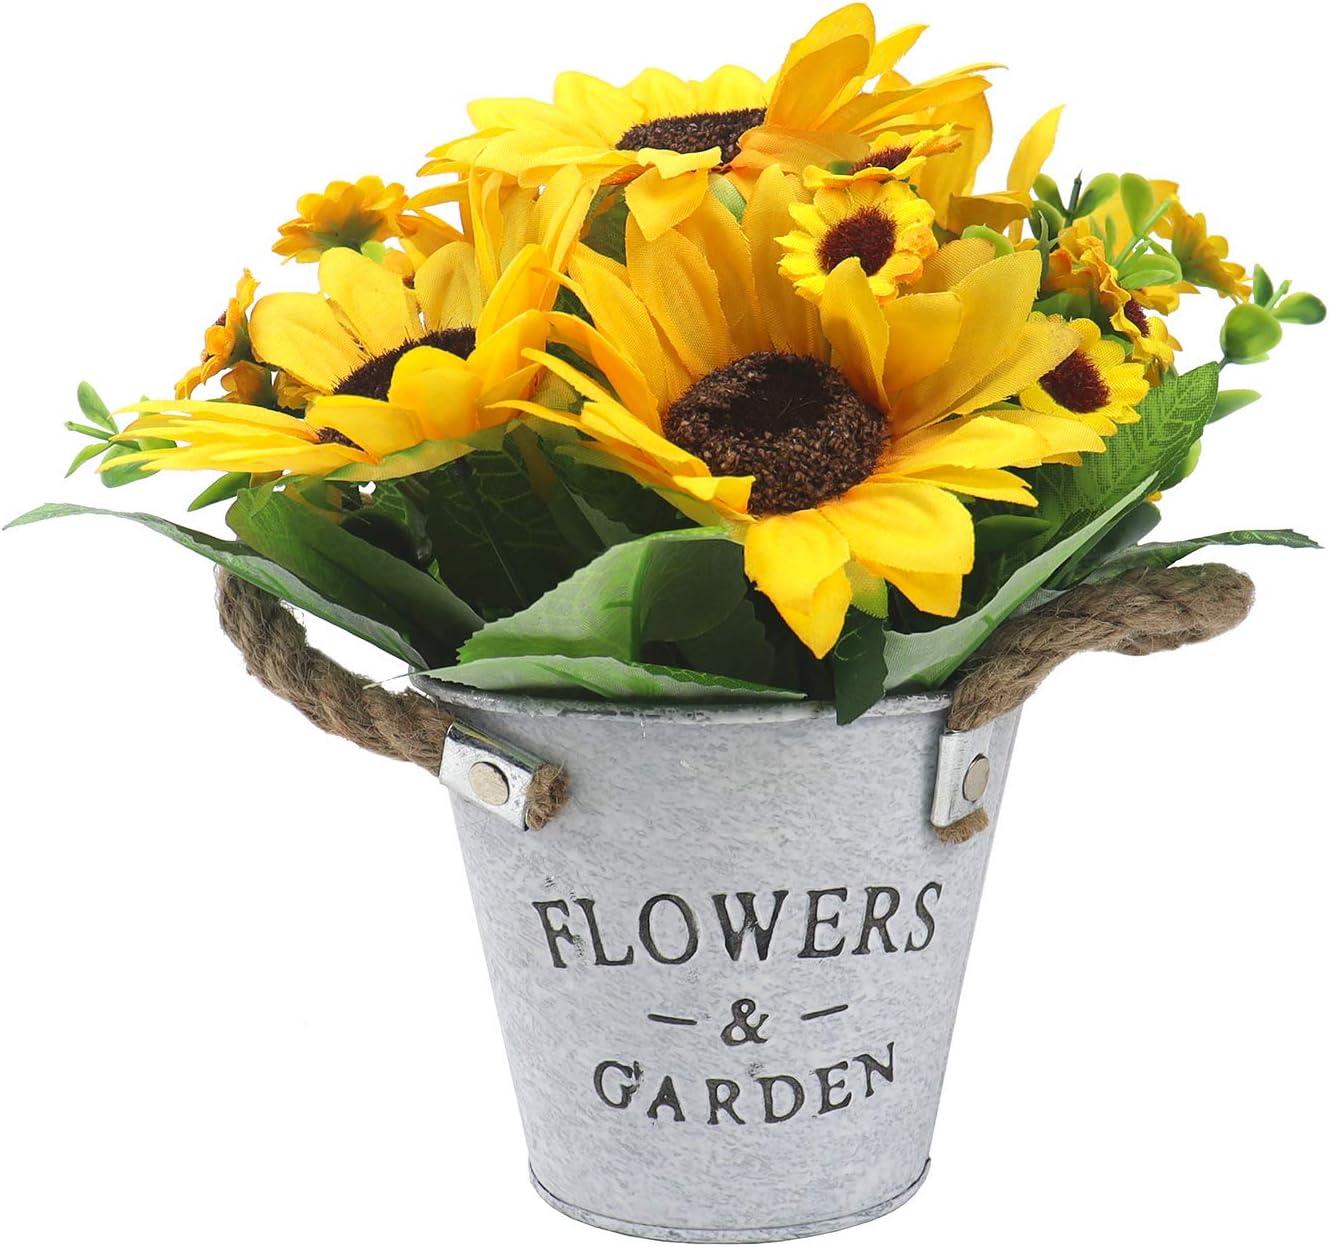 UIKKOT Artificial Flowers with Pot European Style Design Metal Vase Silk Sunflower Arrangements Small Bonsai Centerpieces Decor House Office Restaurant Table (Sunflower Yellow)